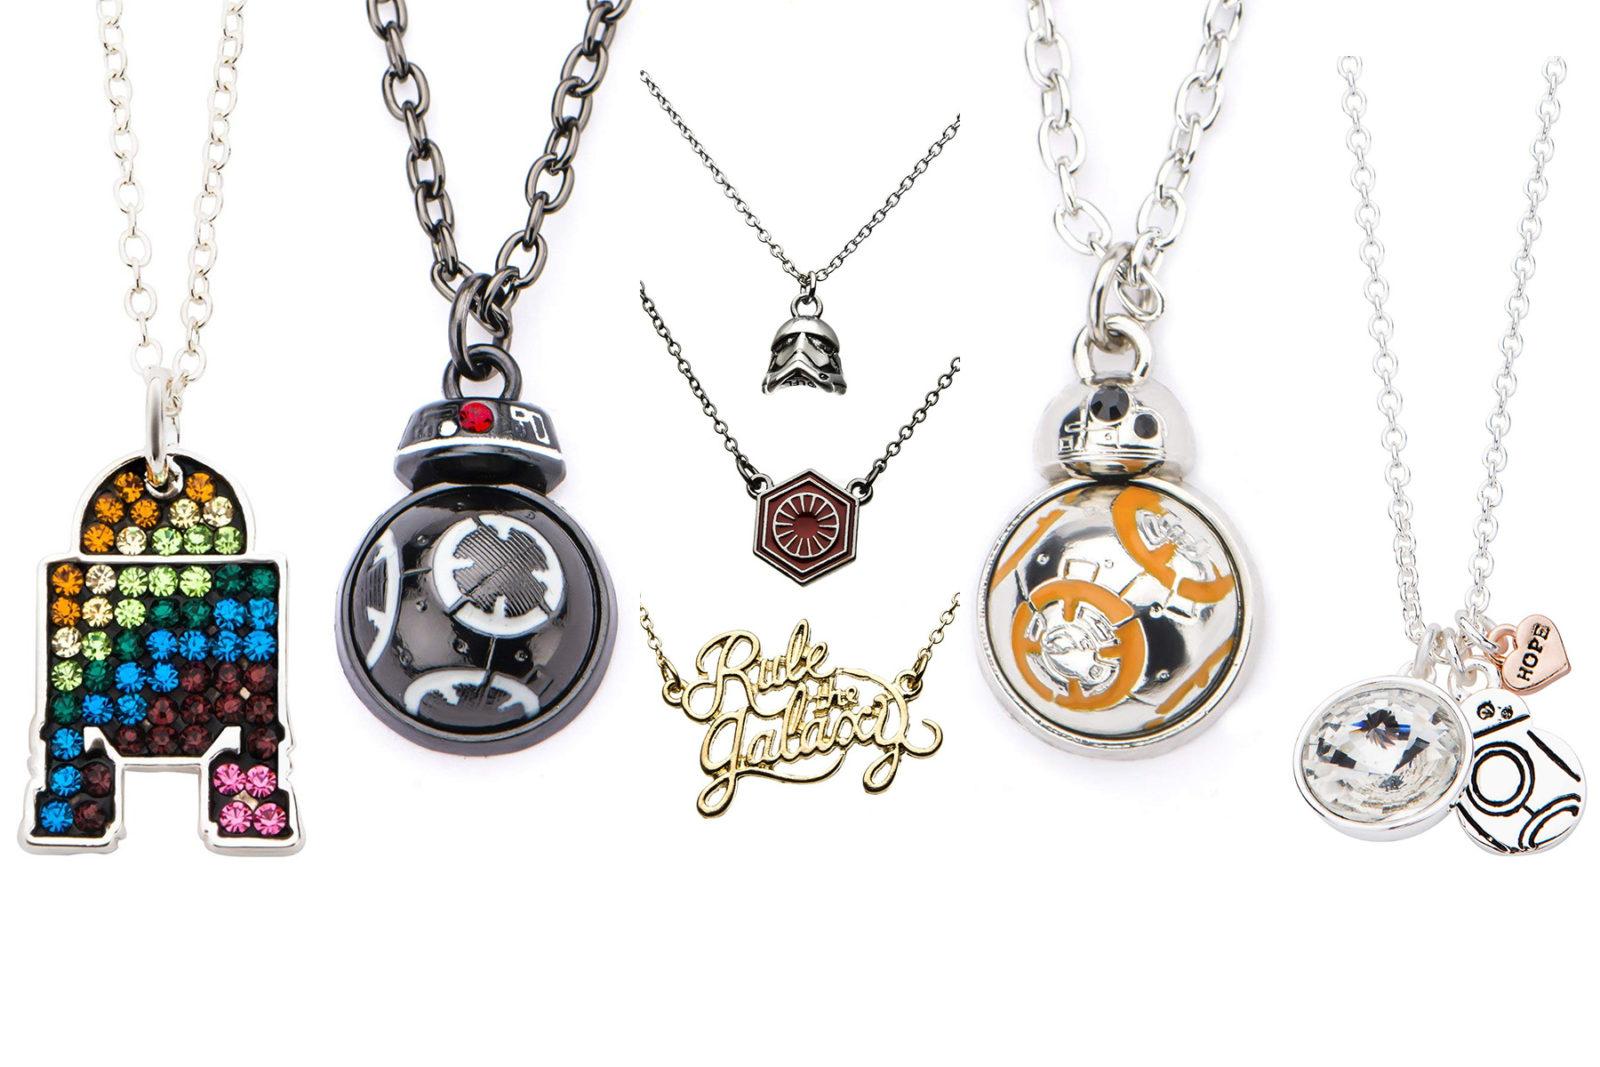 Leia's List – Star Wars Necklaces Under $10